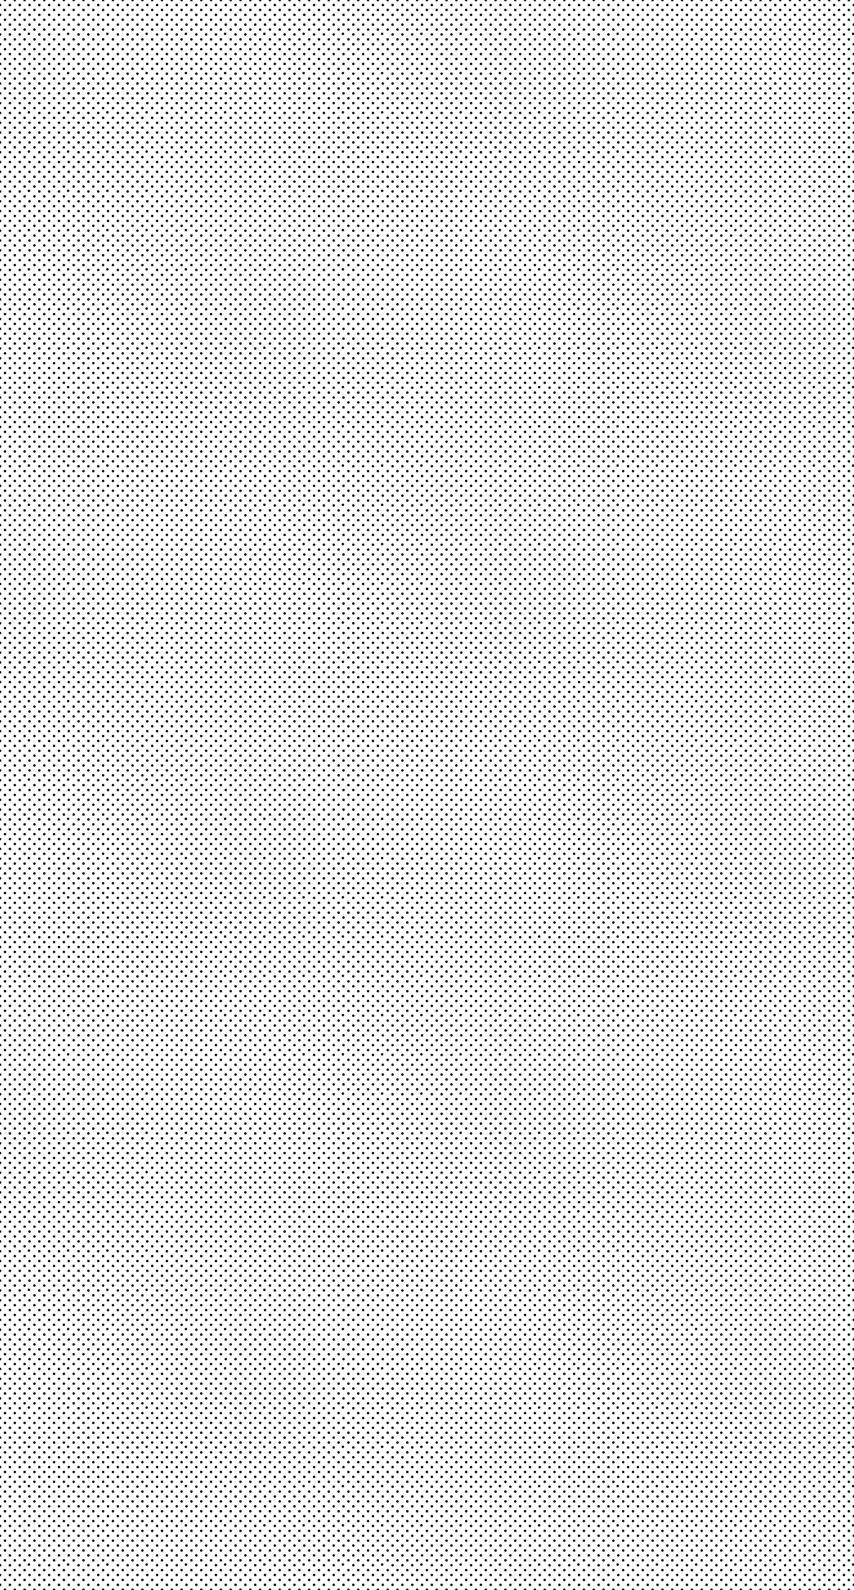 Pattern Dot Black And White Wallpaper Sc Iphone8